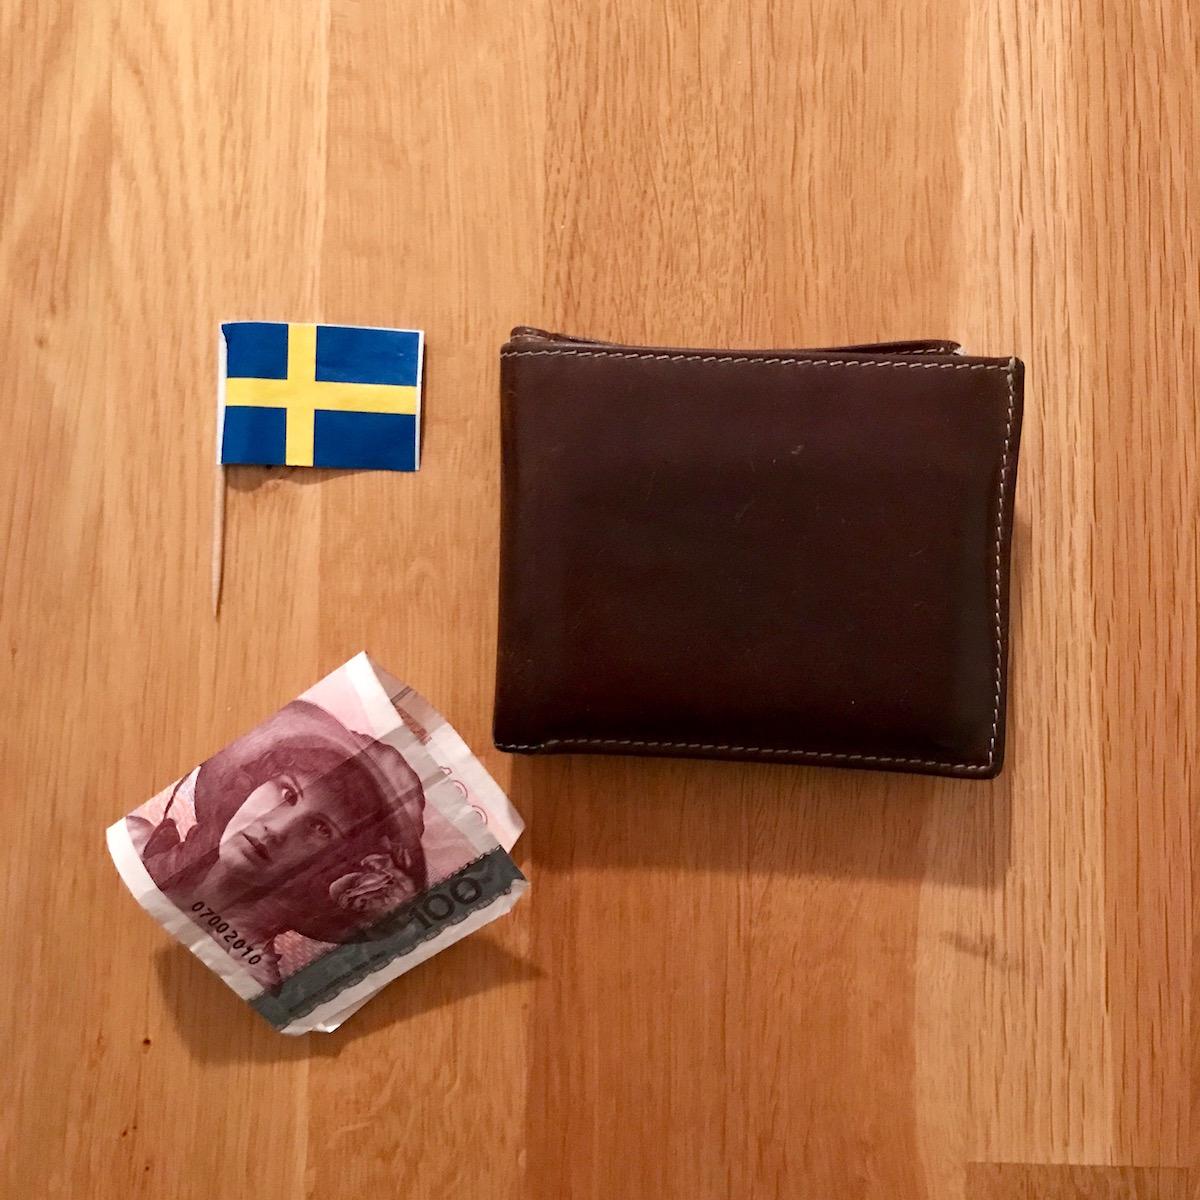 johannes studium erasmus schweden studieren weltweit. Black Bedroom Furniture Sets. Home Design Ideas